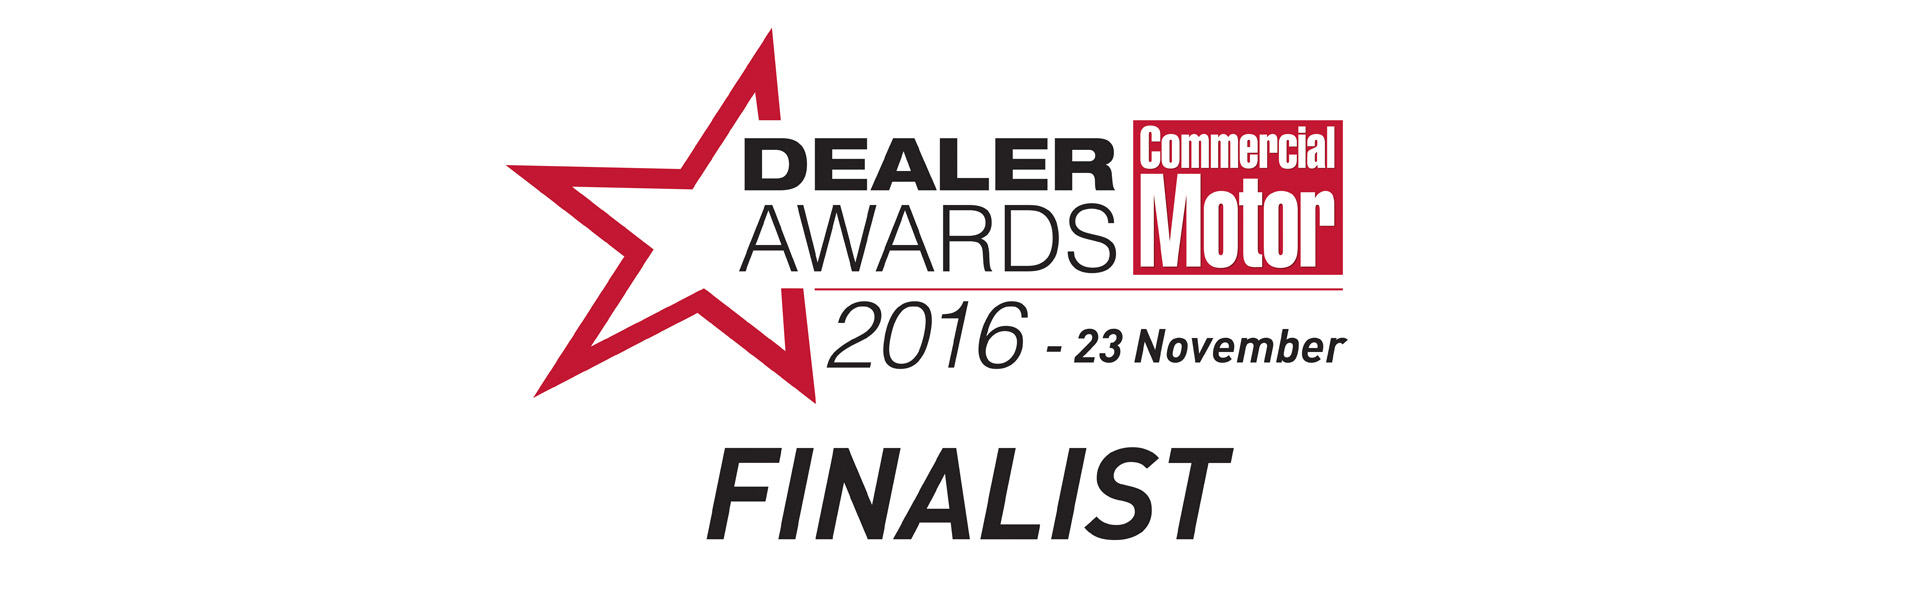 Dealer Awards Finalist